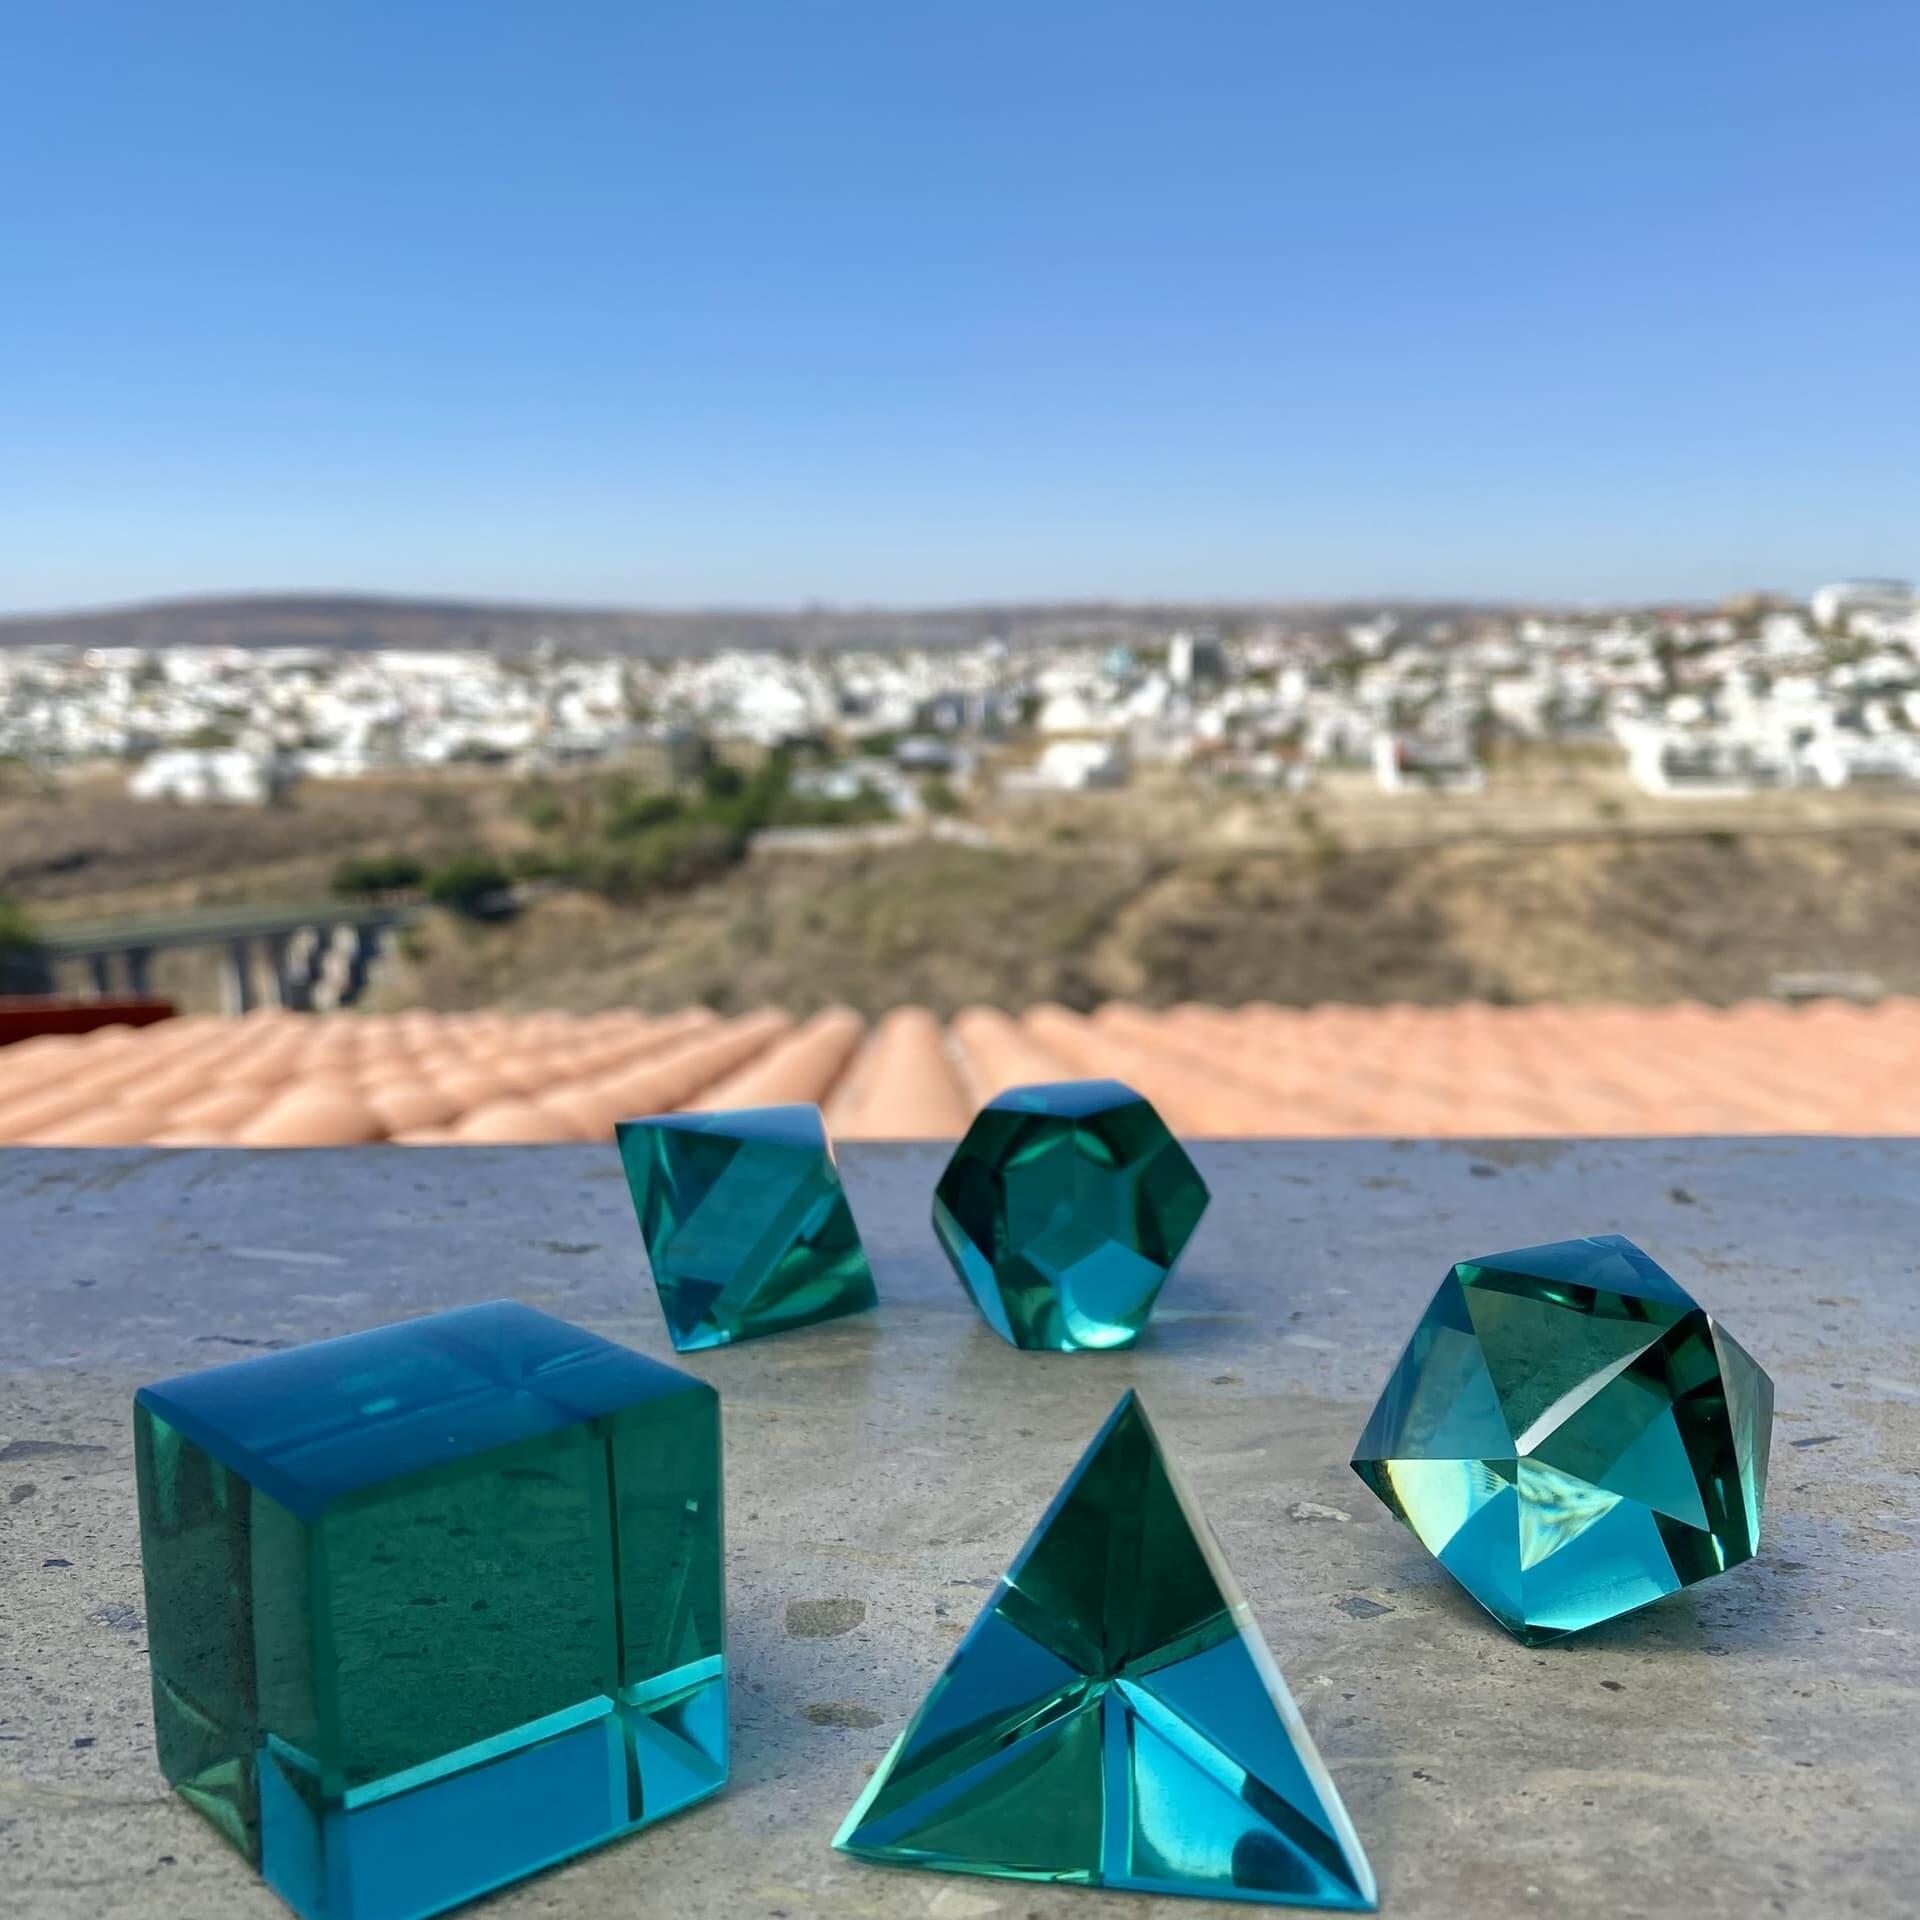 solidos-platonicos-cristal-artesanales-Osaya-COA30